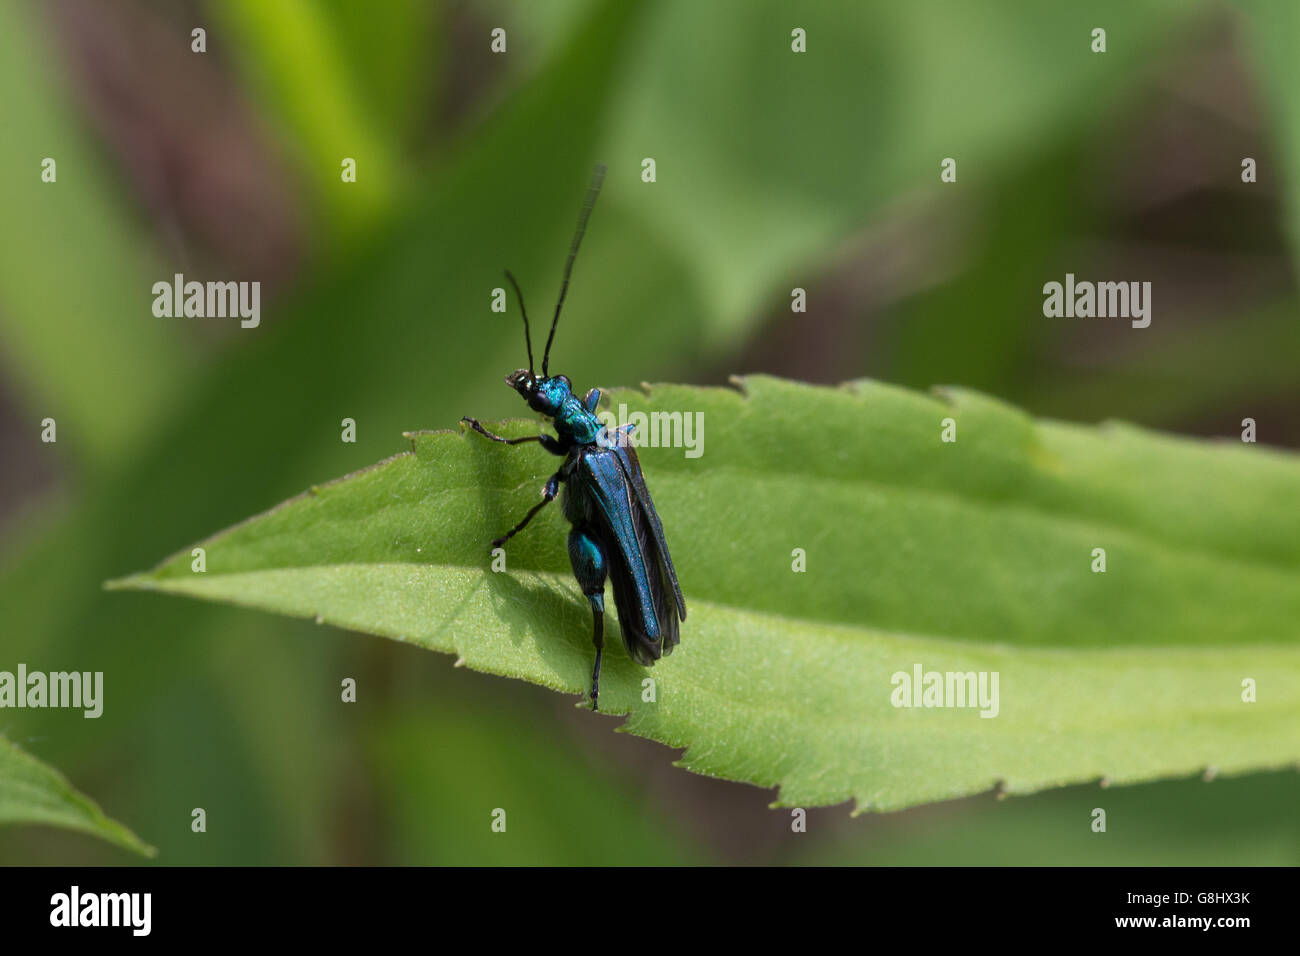 Grüner Scheinbockkäfer auf einen Blatt  Green false blister beetle on a leaf - Stock Image